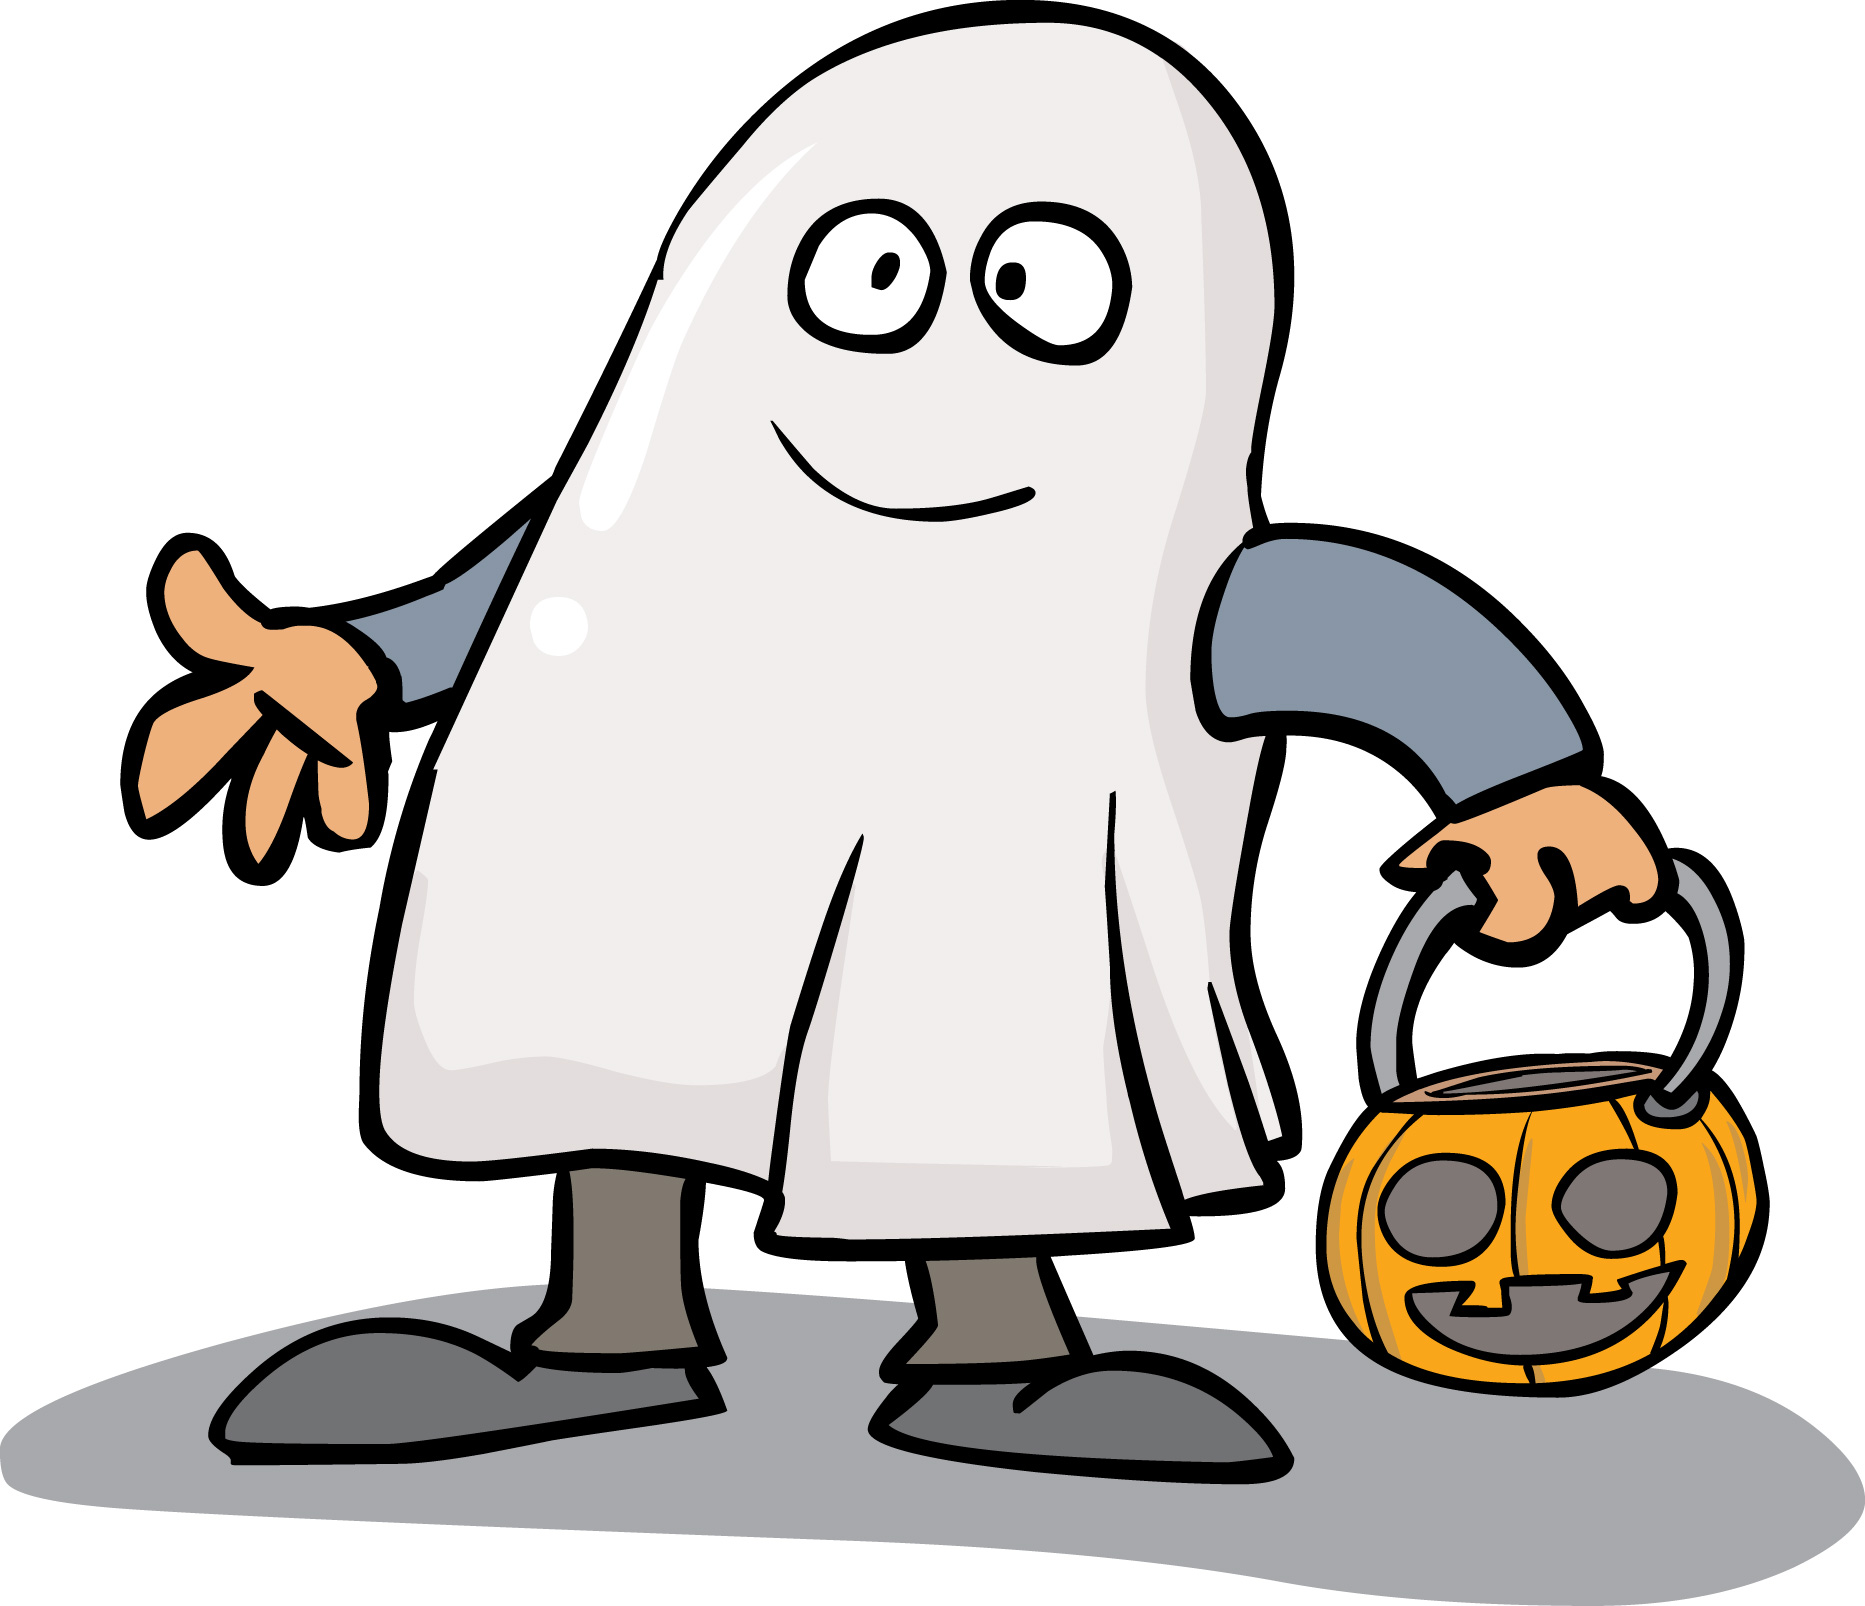 kid friendly halloween clipart at getdrawings com free for rh getdrawings com clipart of halloween costumes clipart of halloween pictures